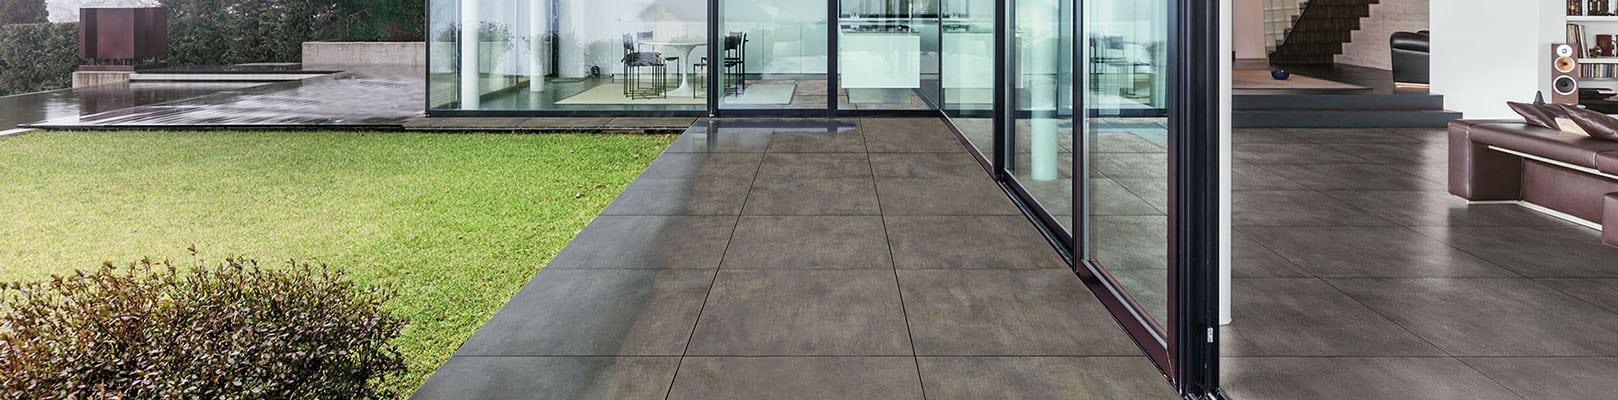 Lemmens Tegels | Keramische tegels - woonkamer & terras